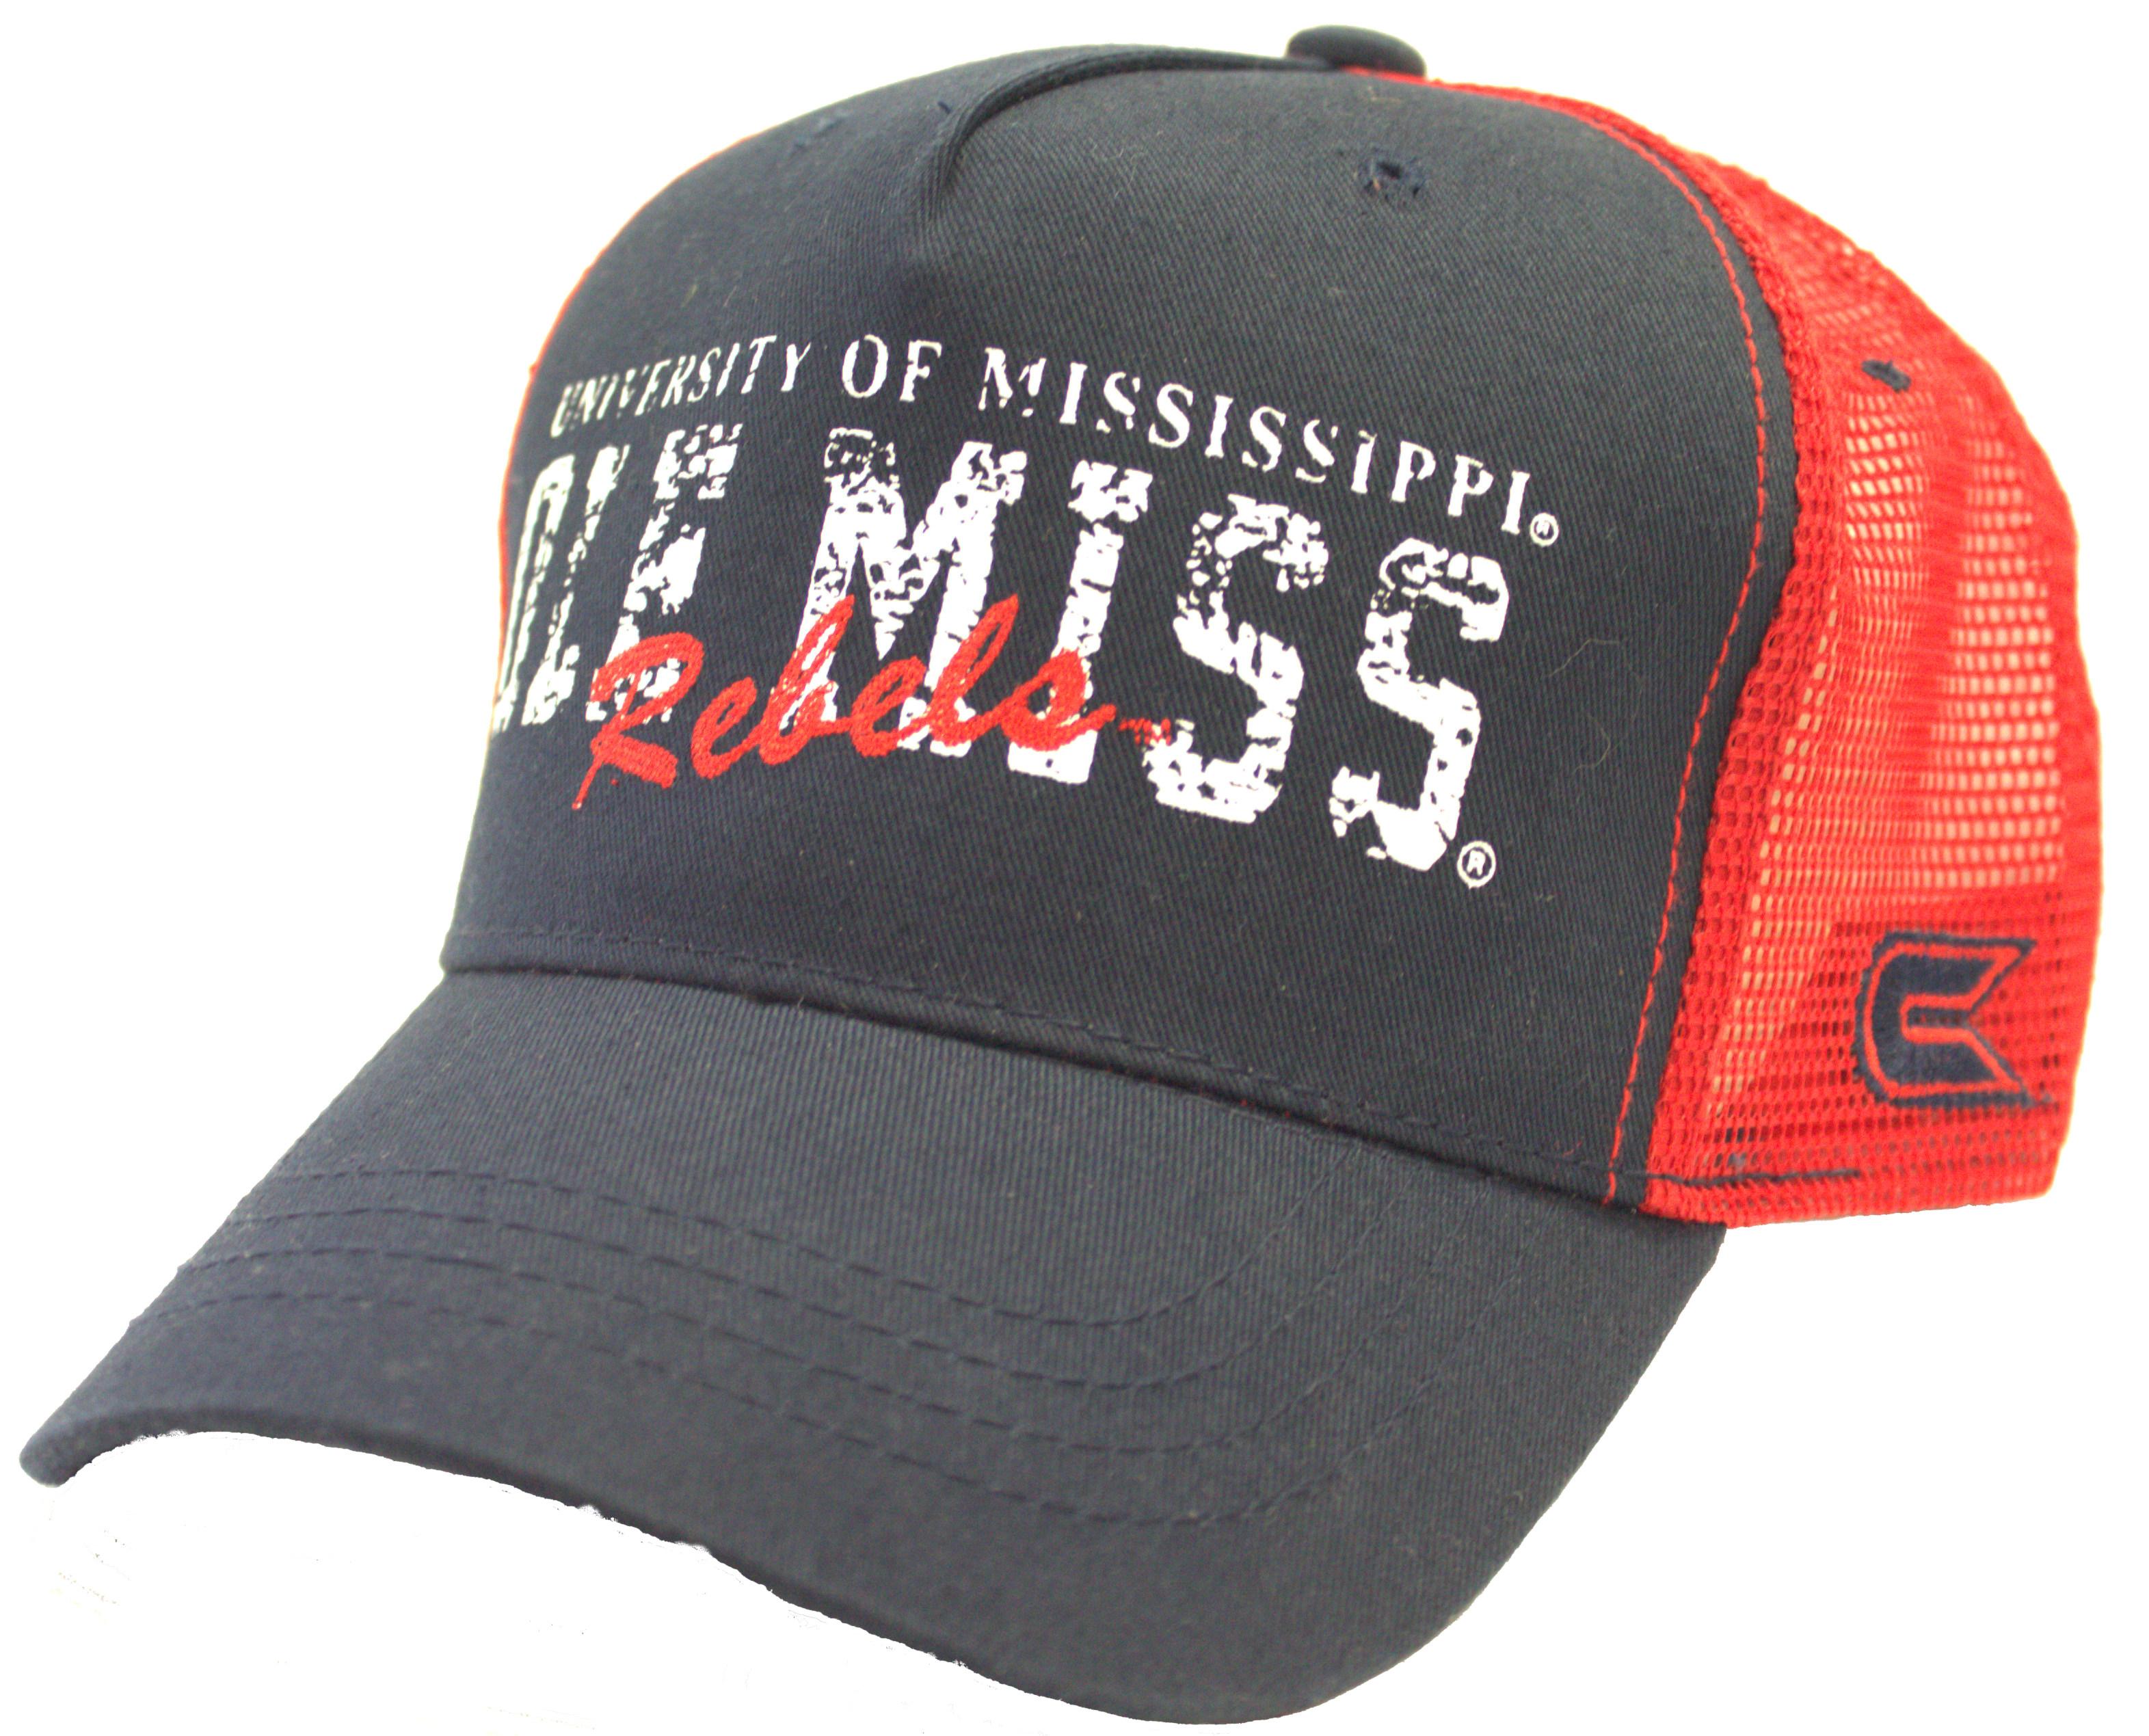 c67640b60dc1f Ole Miss Rebels Trucker style Adjustable Hat 687927649484